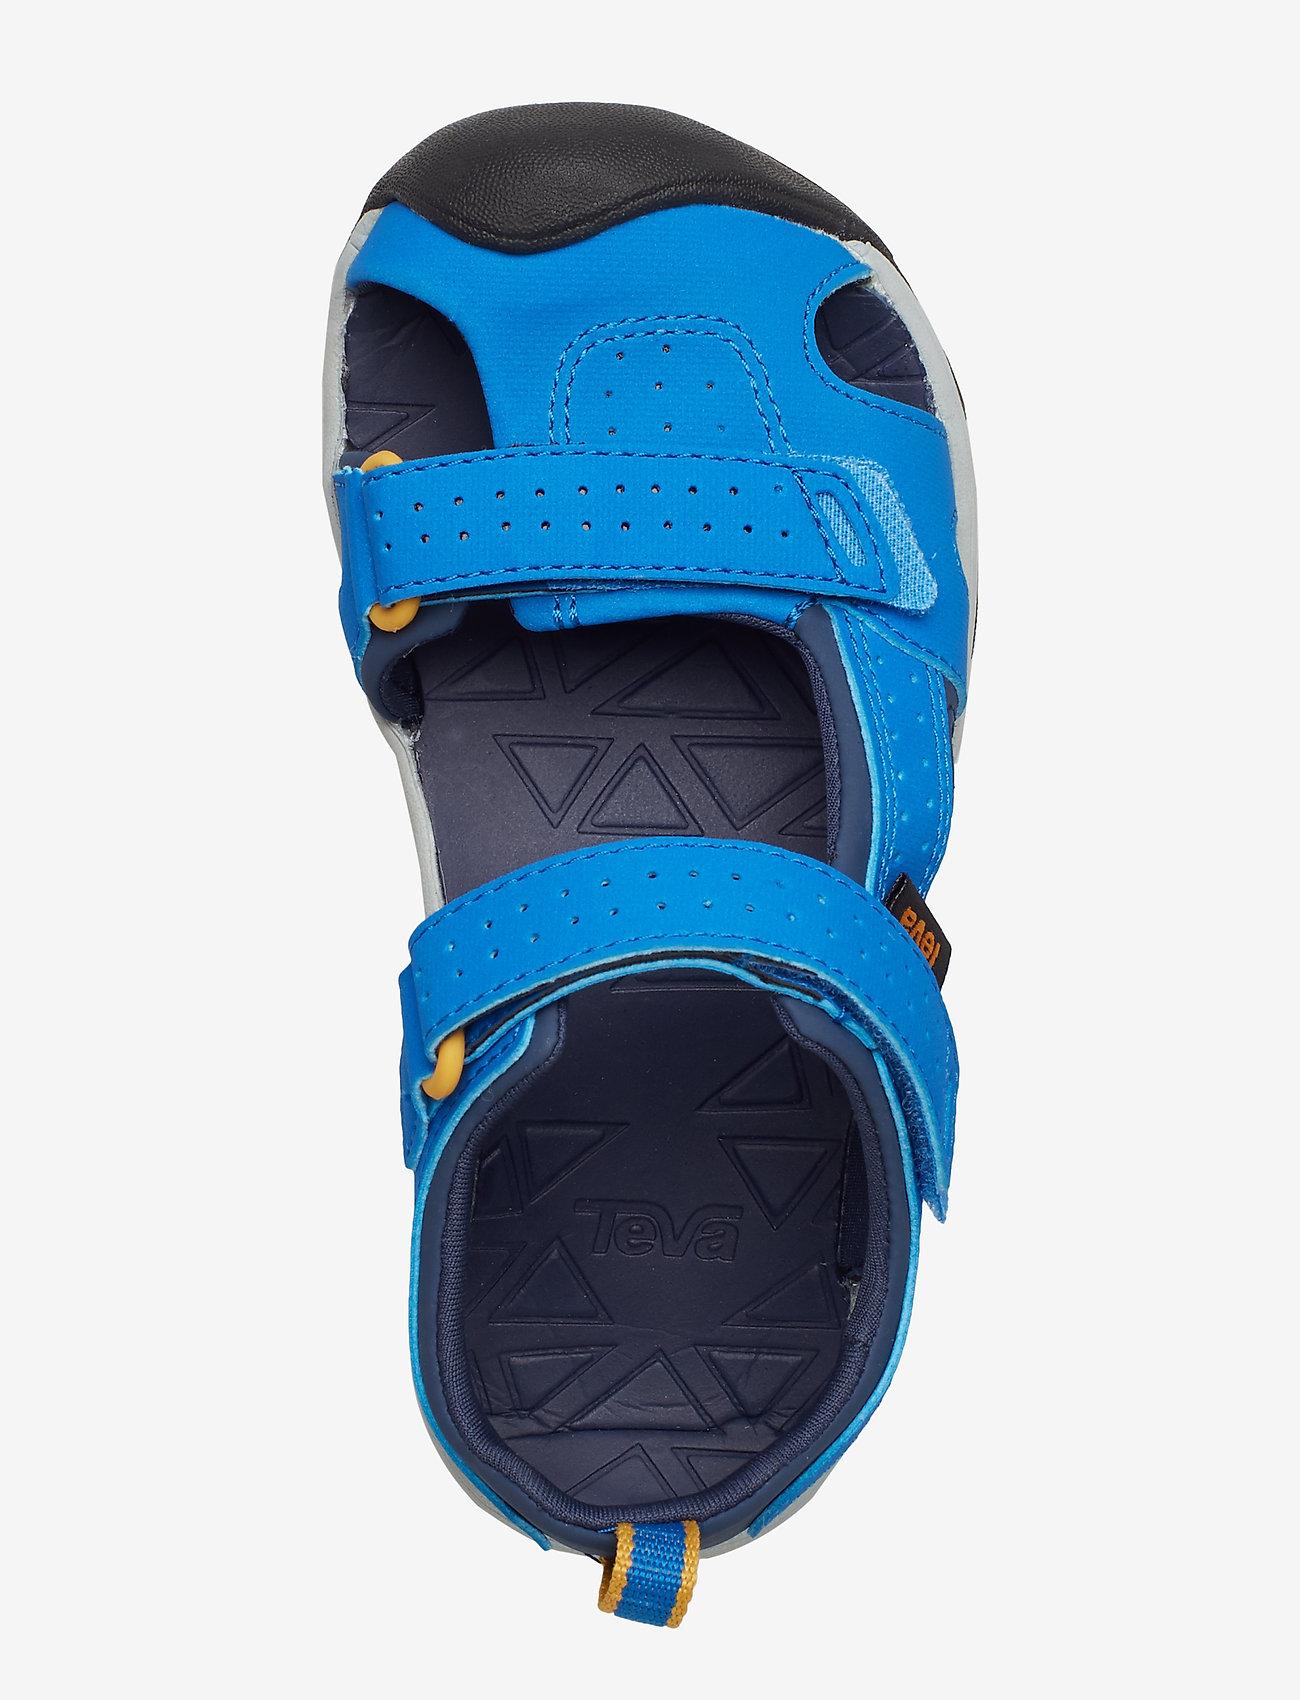 Teva K Hurricane Toe Pro Dazzling Blue